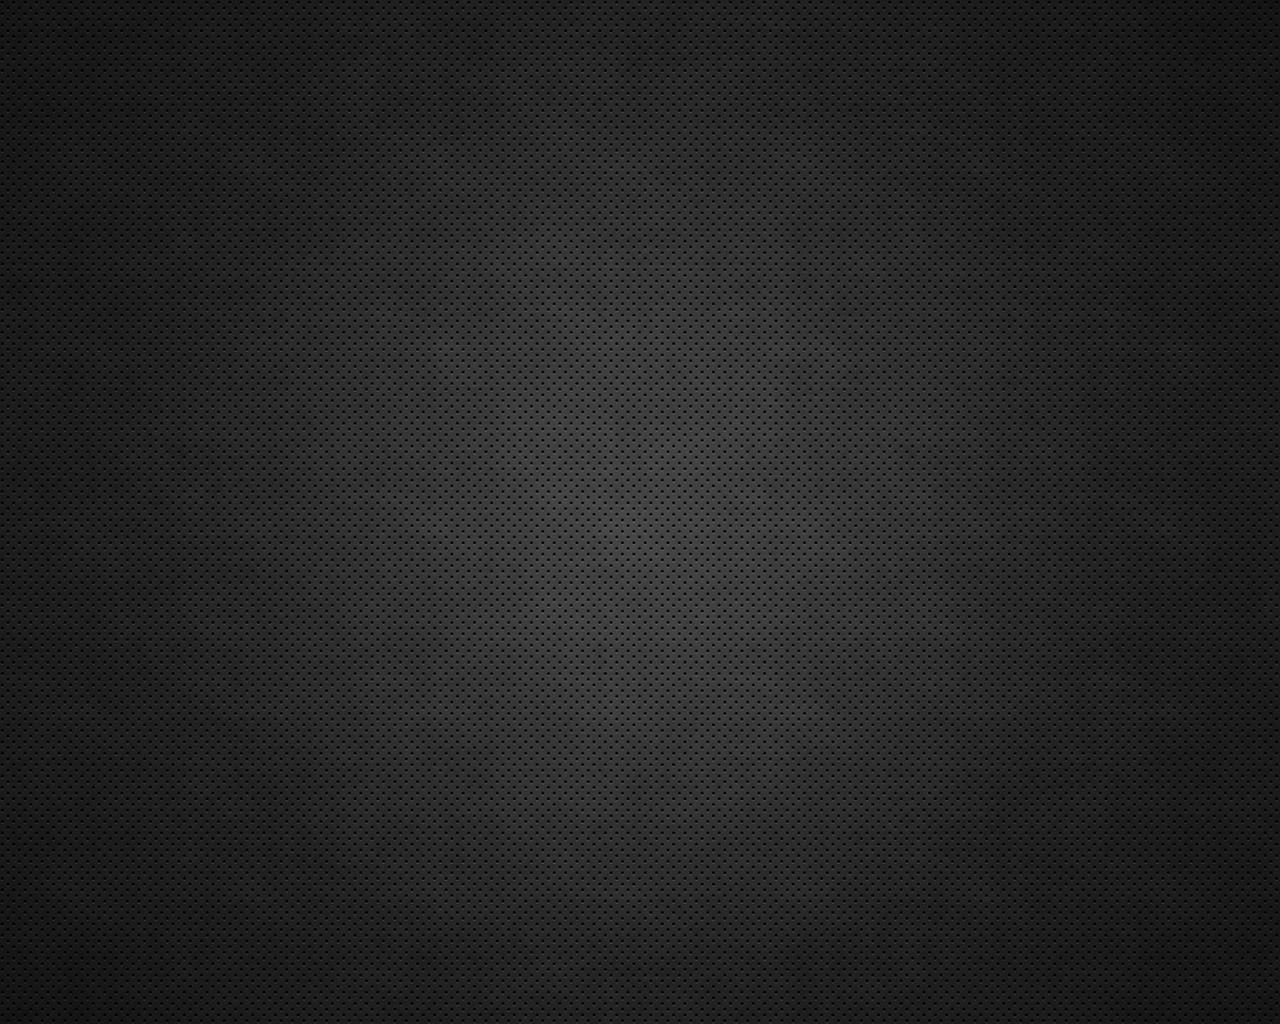 gris hq fondo negro -#main